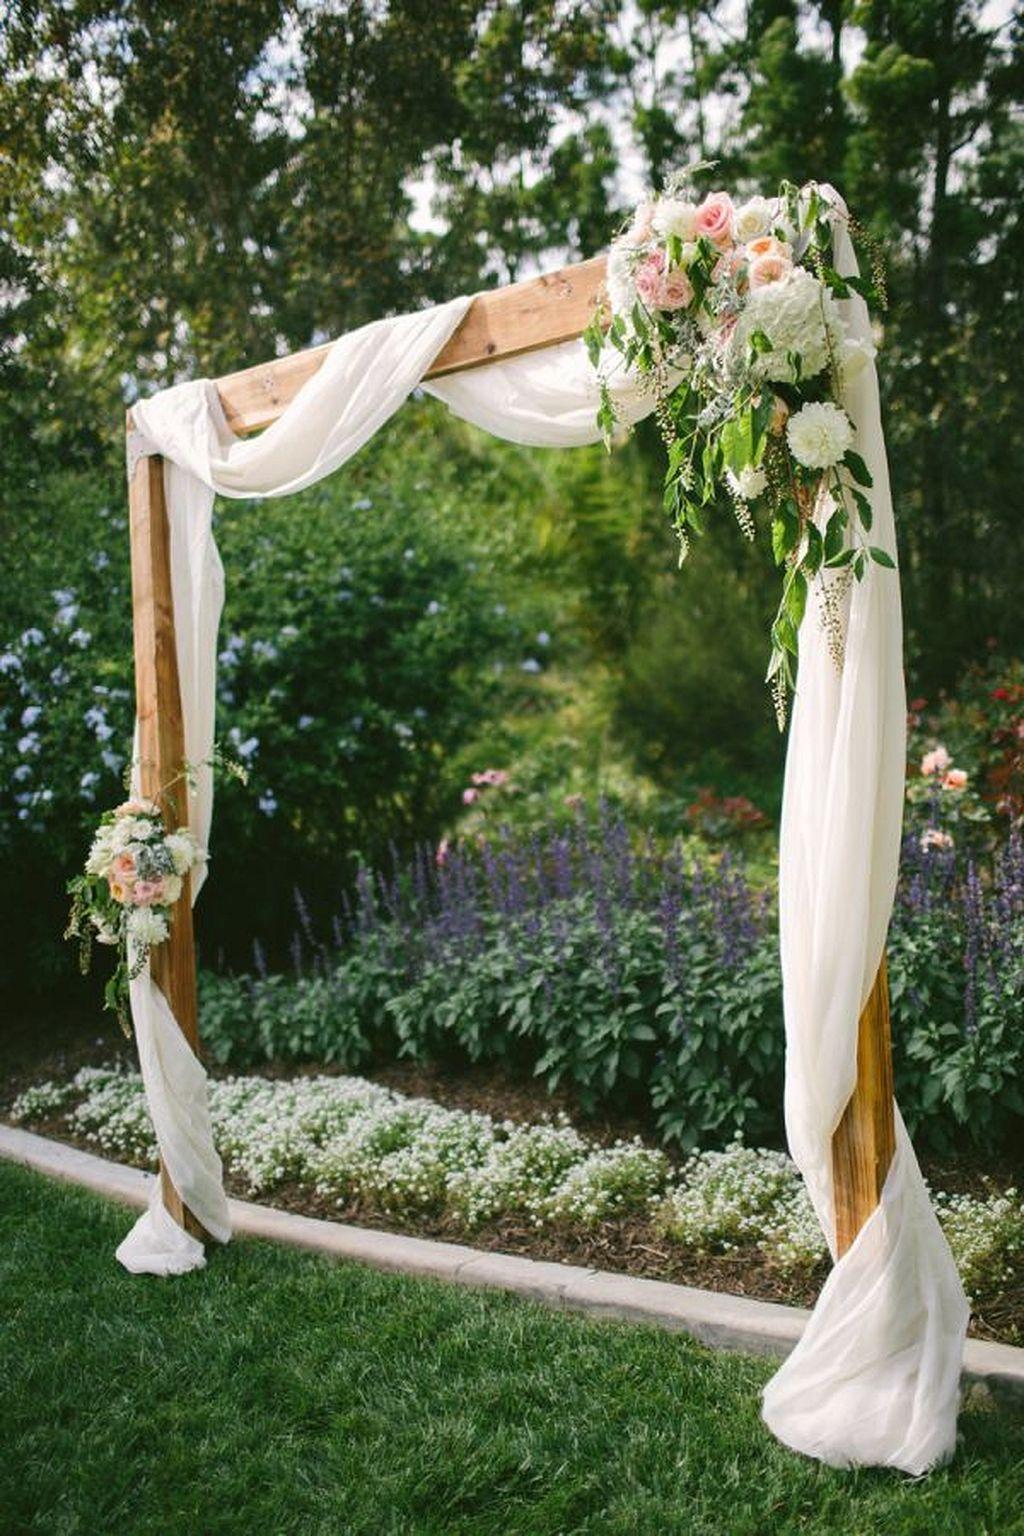 97 Floral Wedding Arch Decoration Ideas | Arches, Wedding and ...